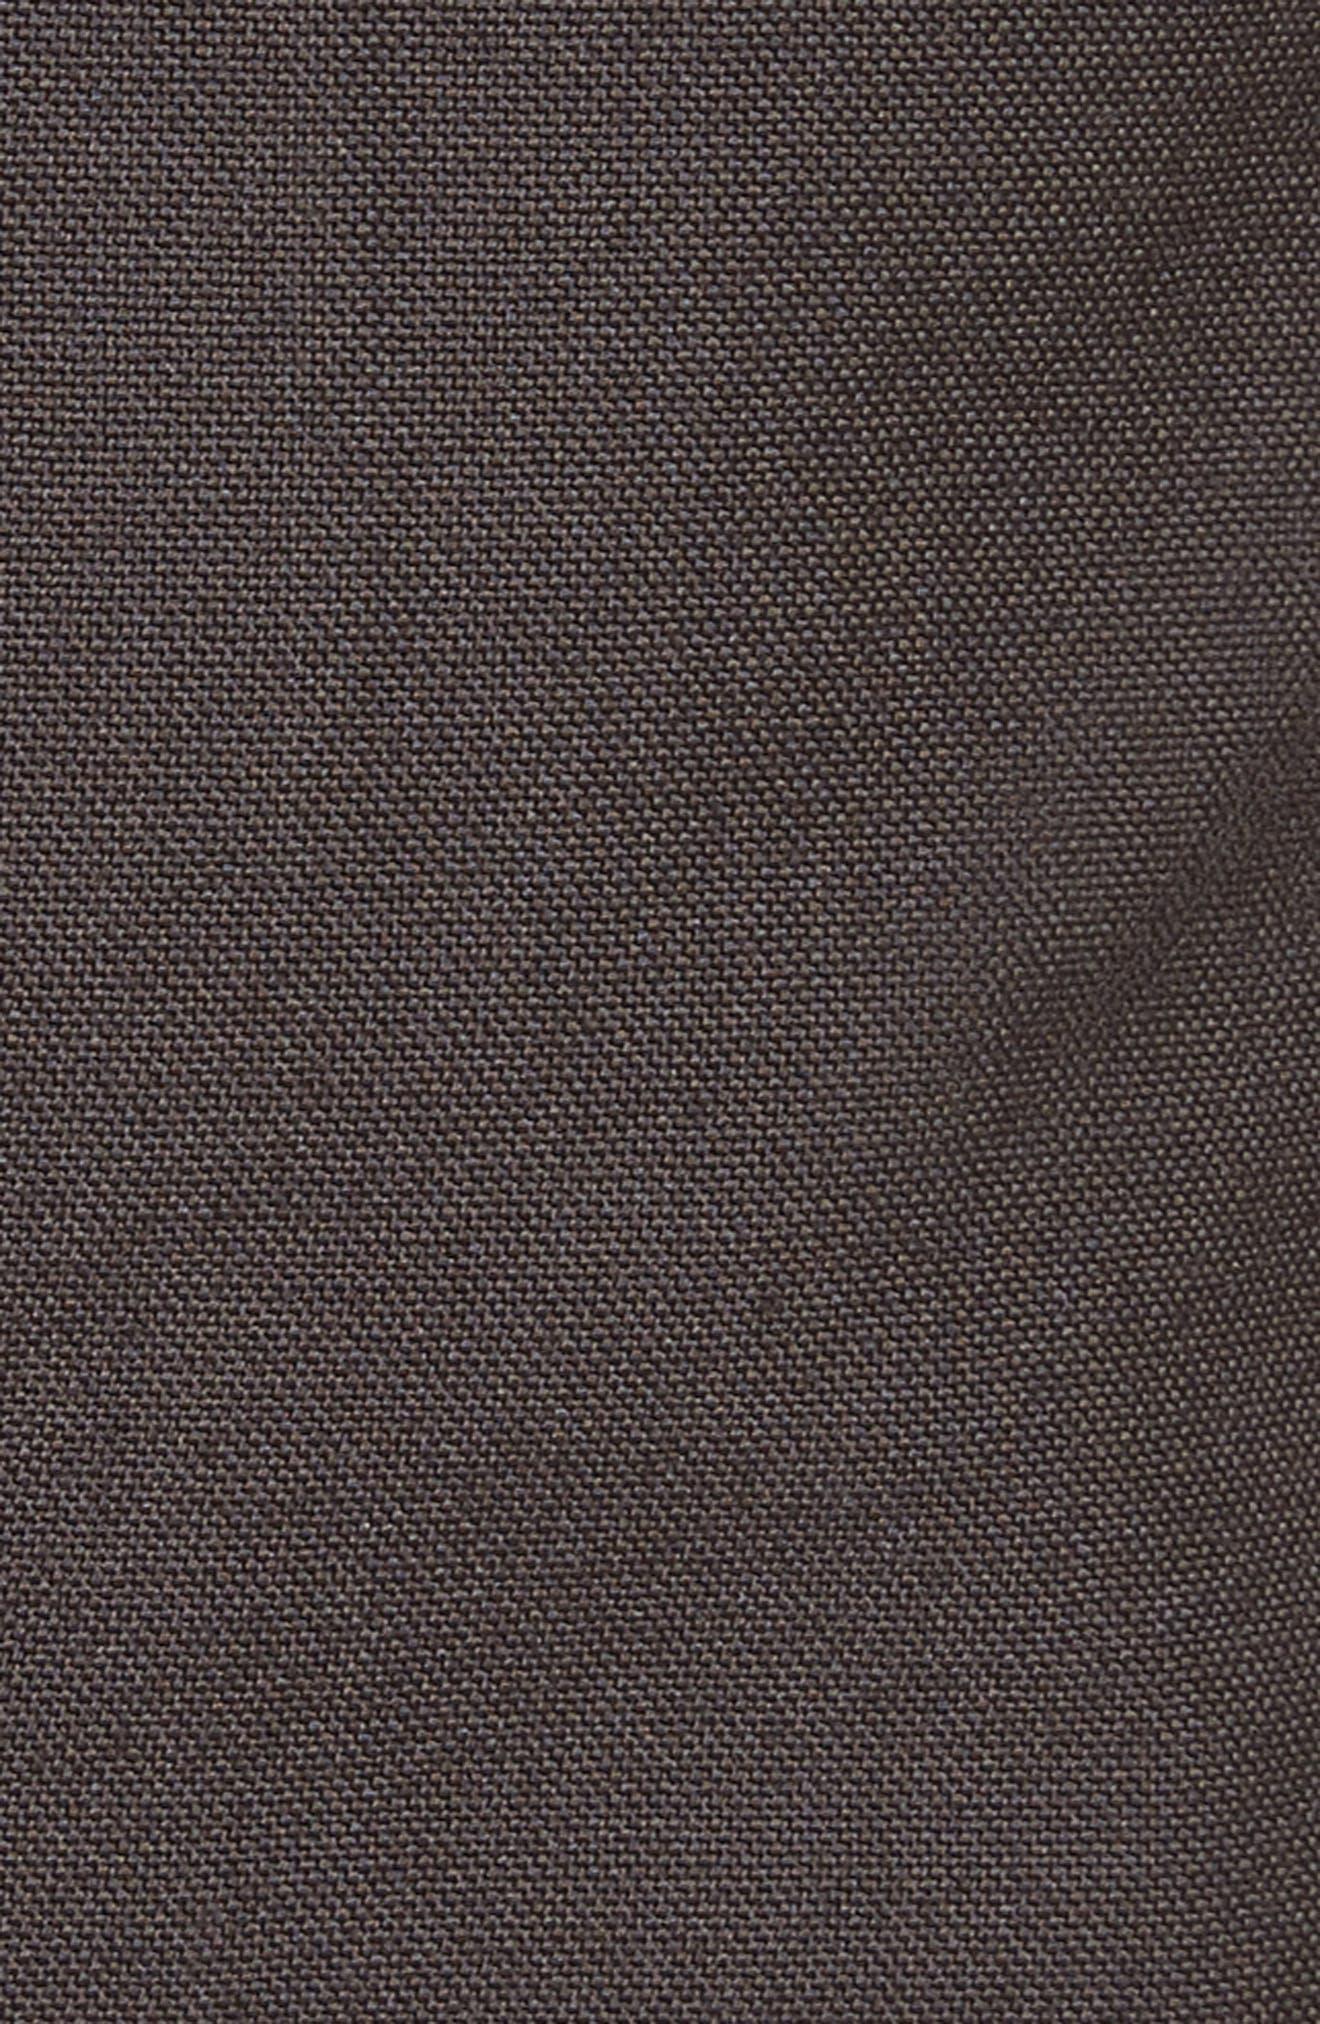 Cropped Drawstring Cargo Pants,                             Alternate thumbnail 5, color,                             Brown